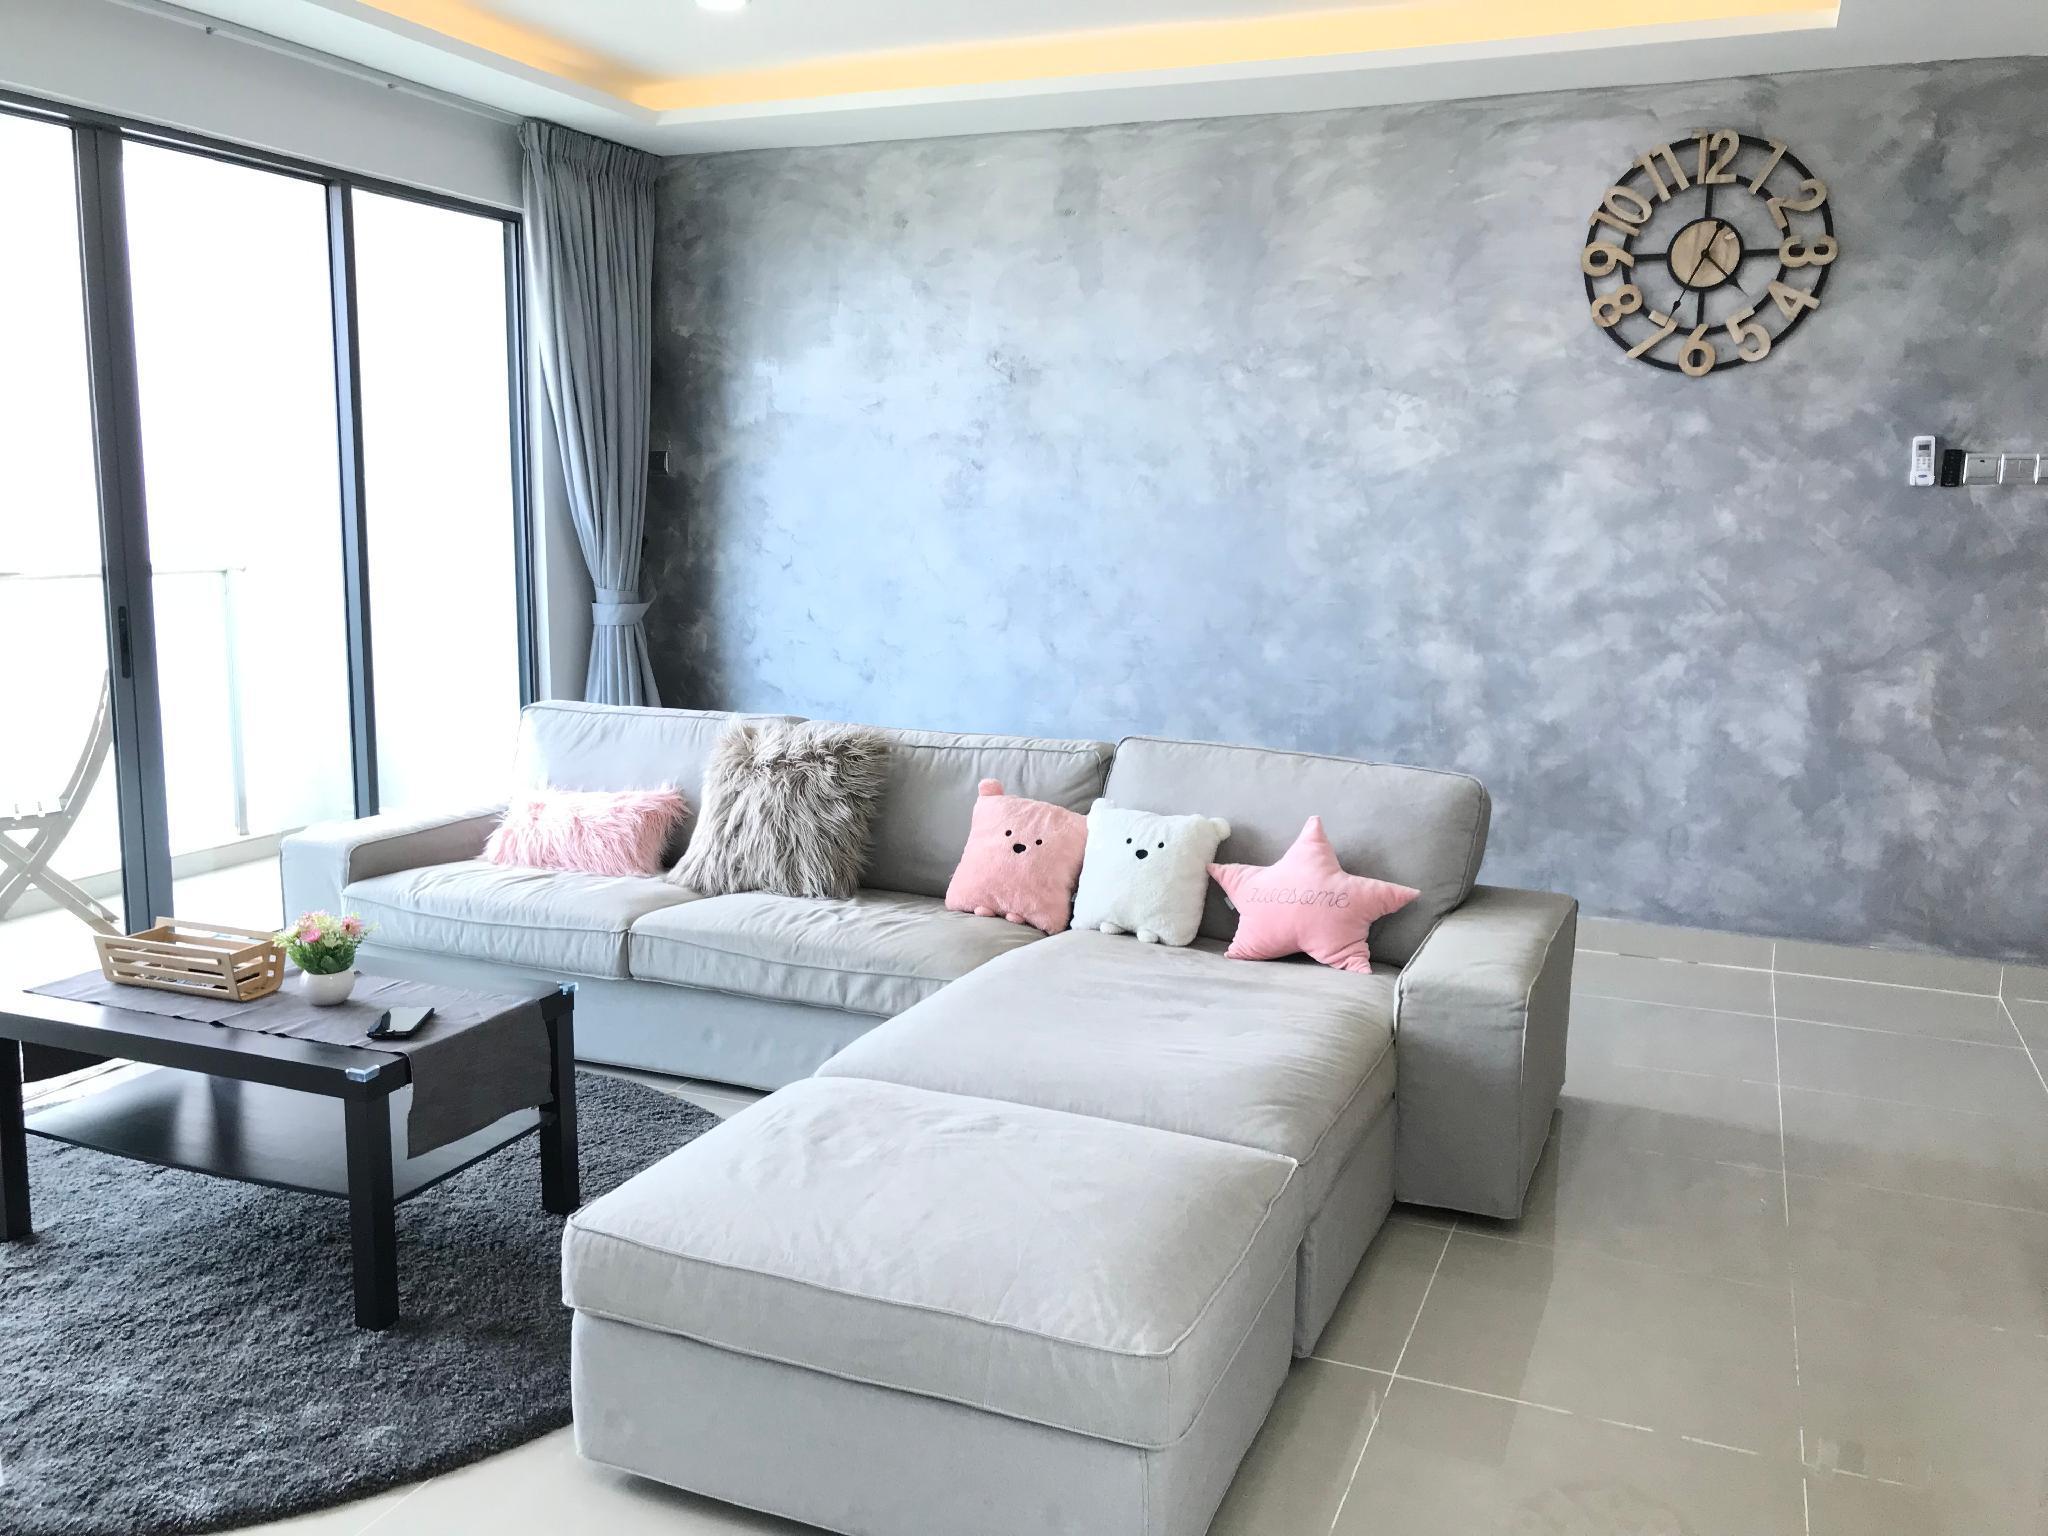 AMERIN 3R2B Luxurious Homestay TheMines TBS UPM